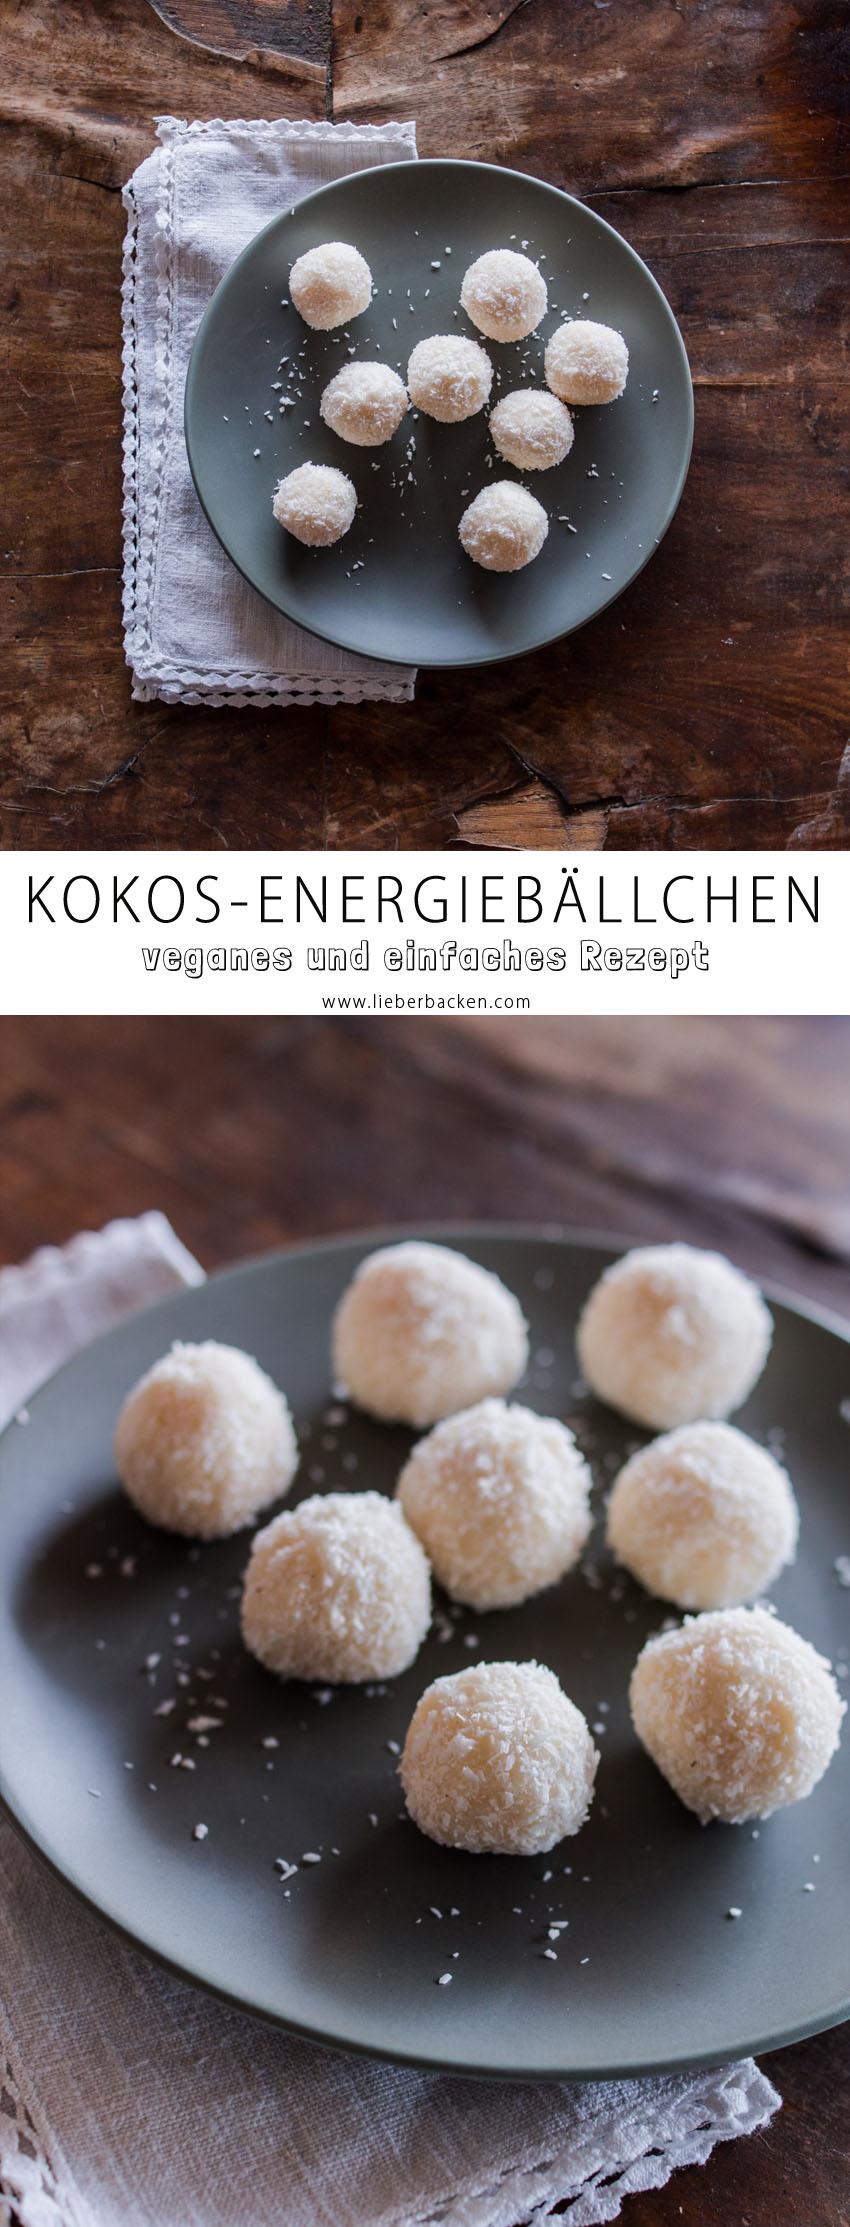 Vegane Kokos-Energiebällchen